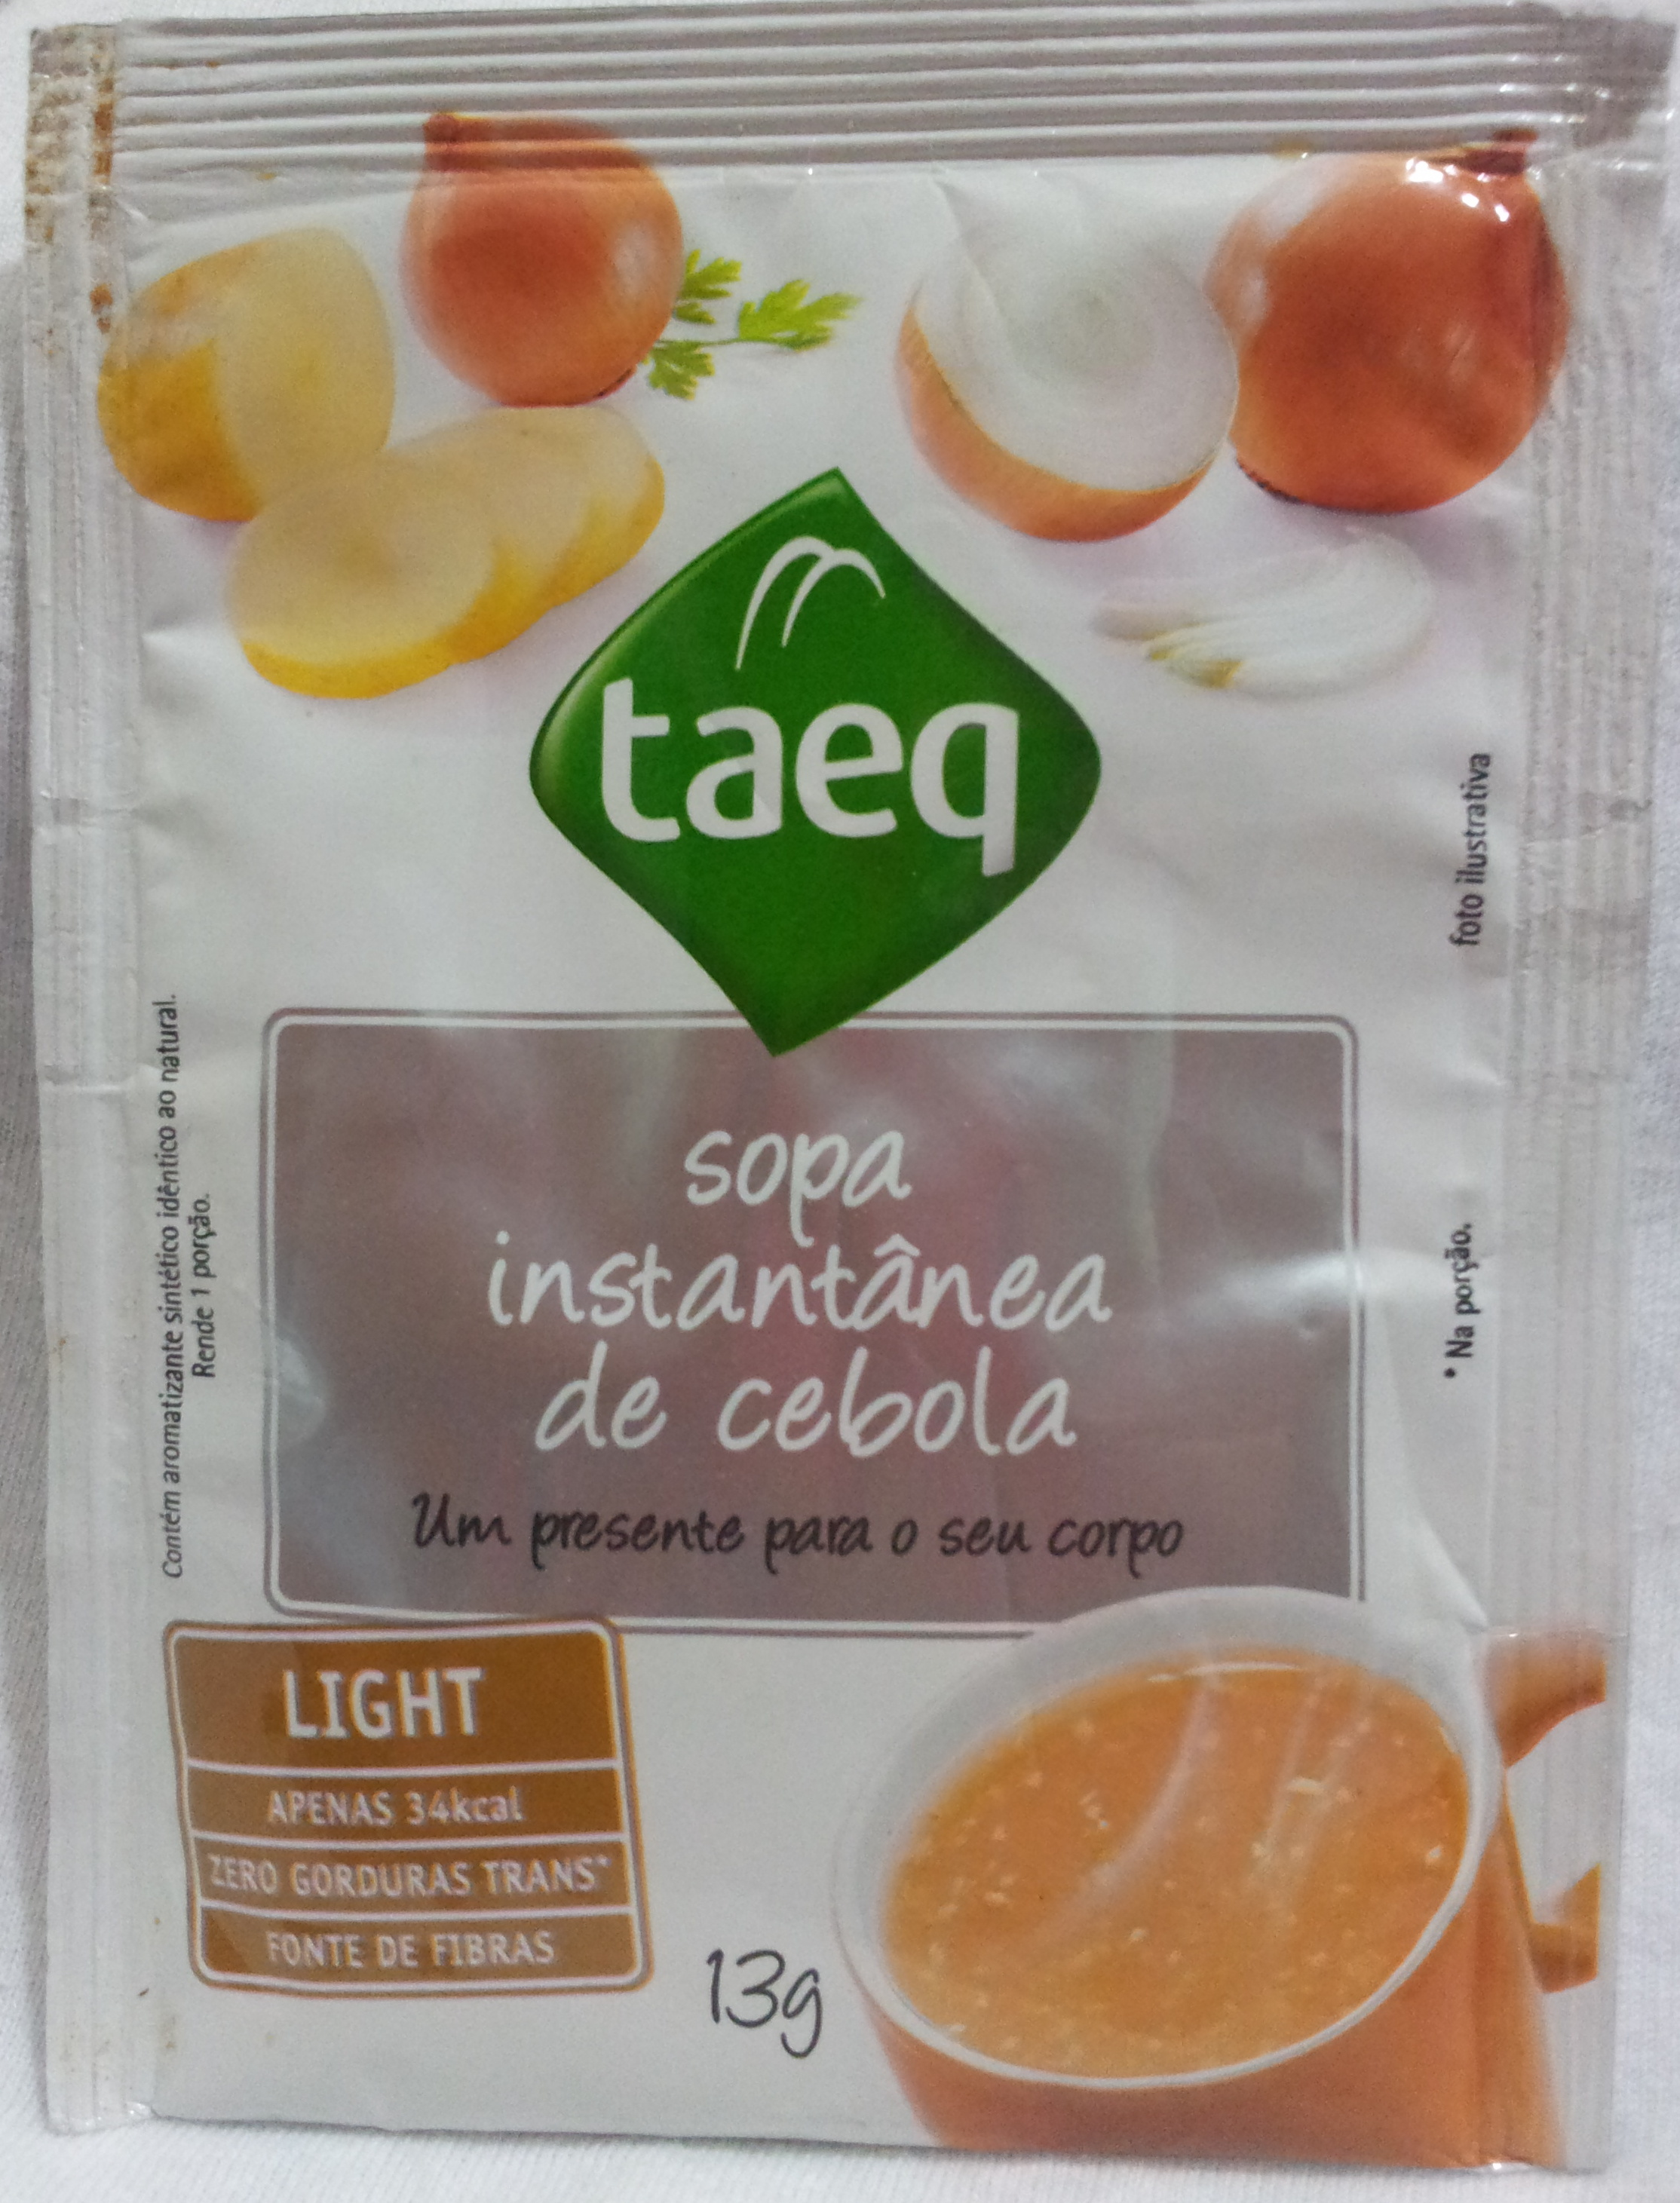 taeq Sopa Instantânea de Cebola - Produto - pt